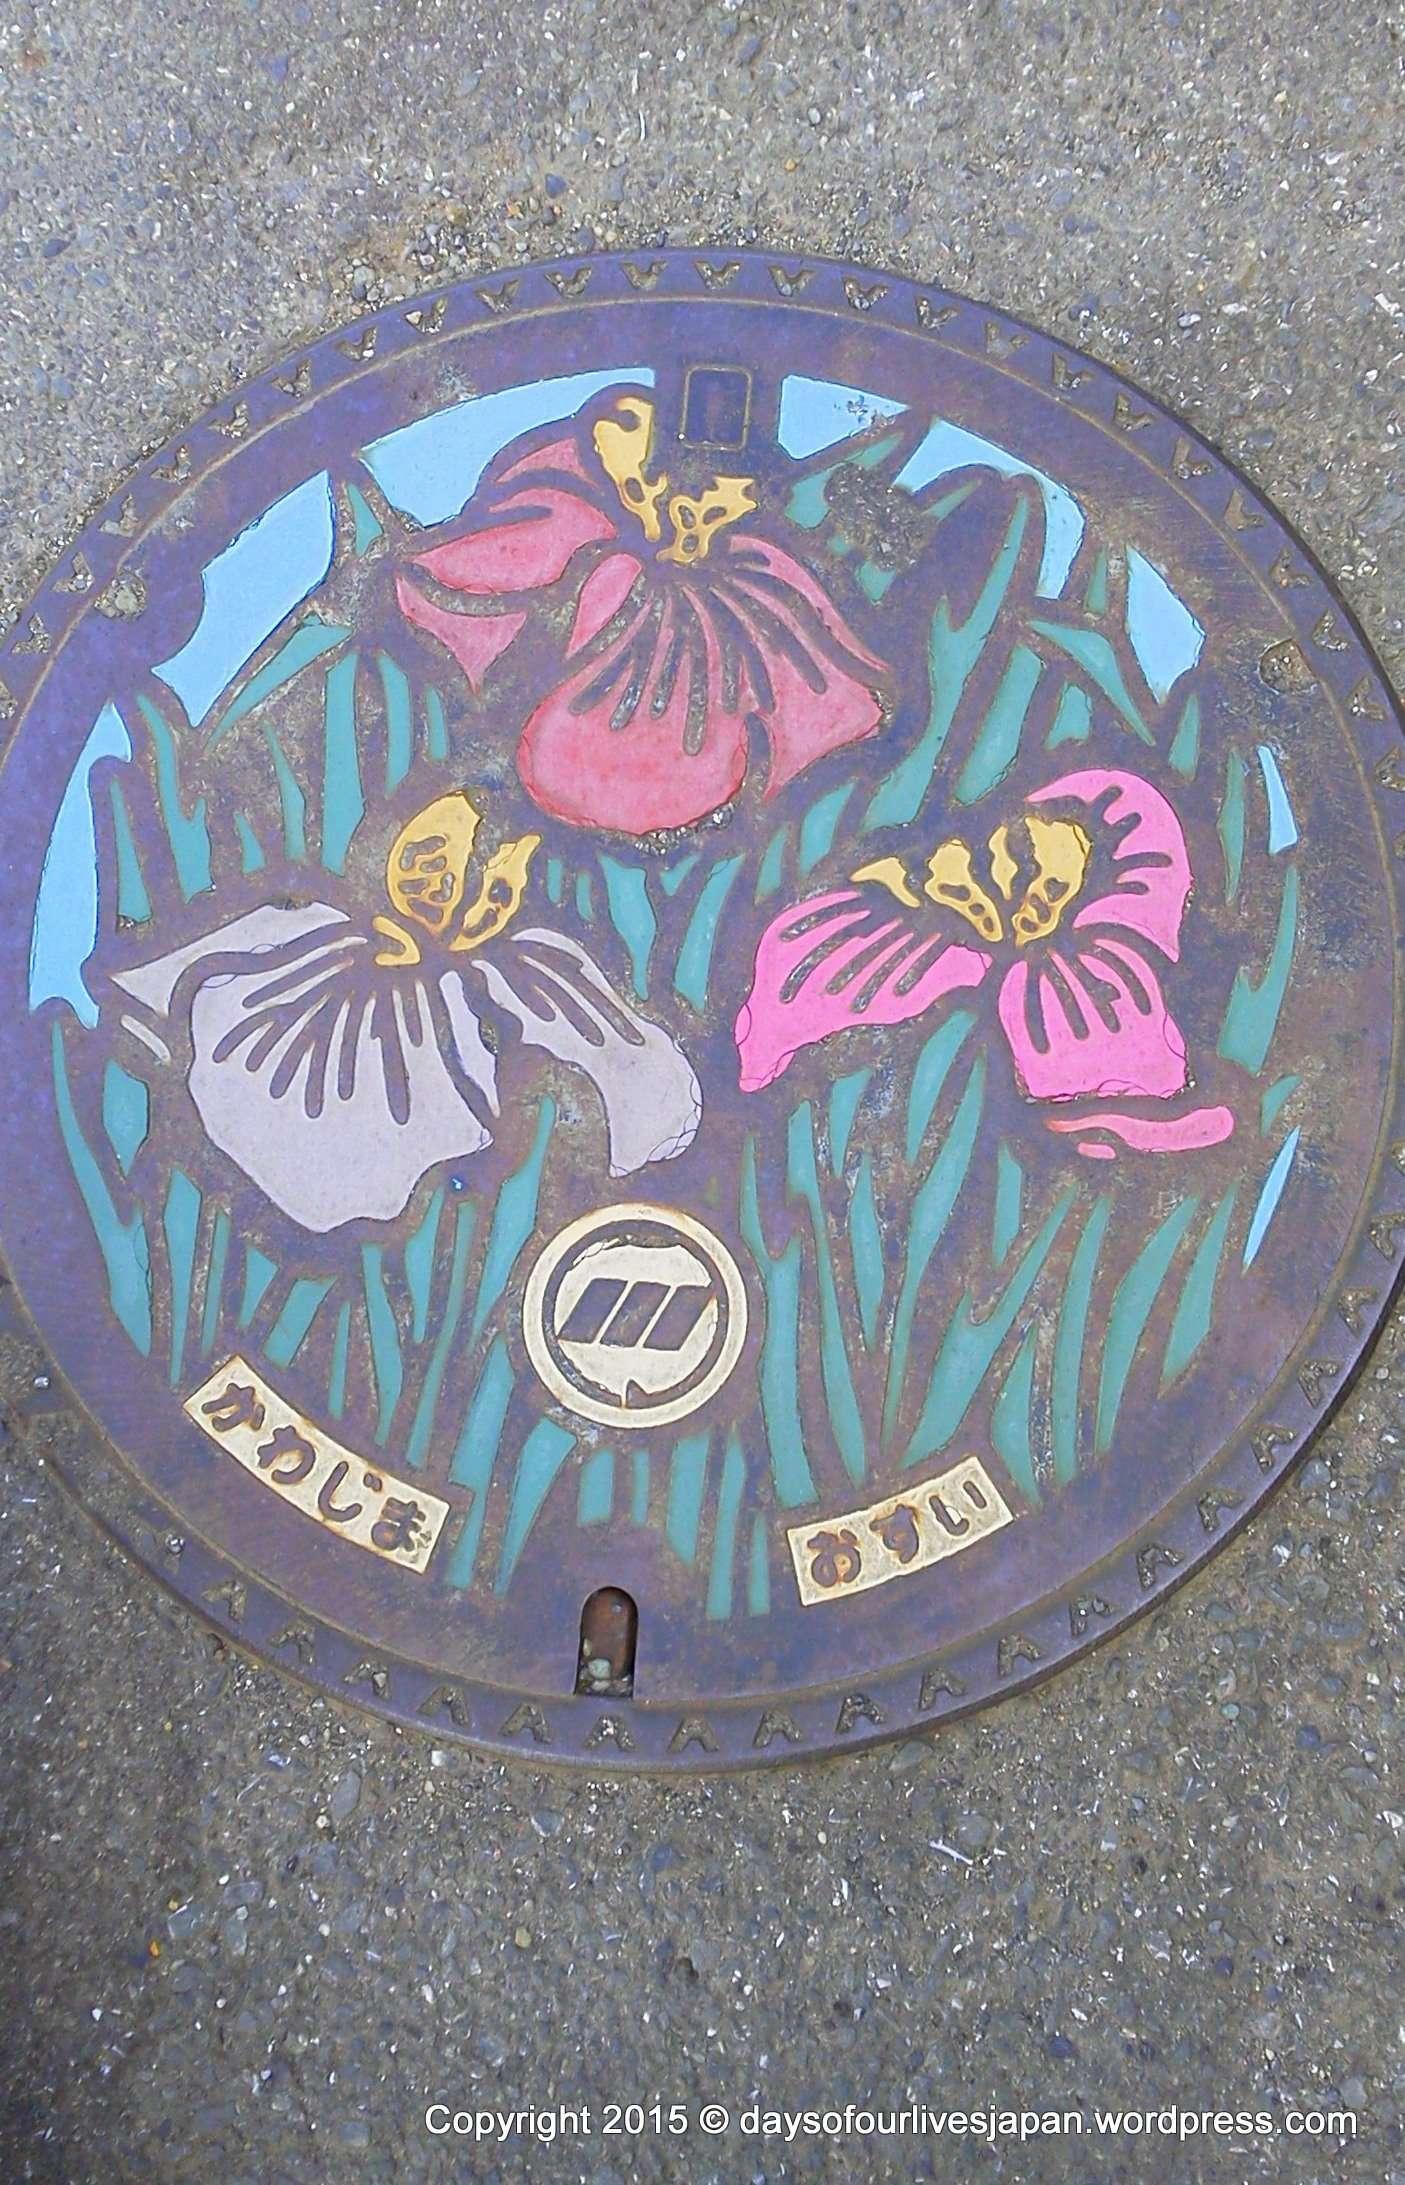 Manhole cover art Saitama